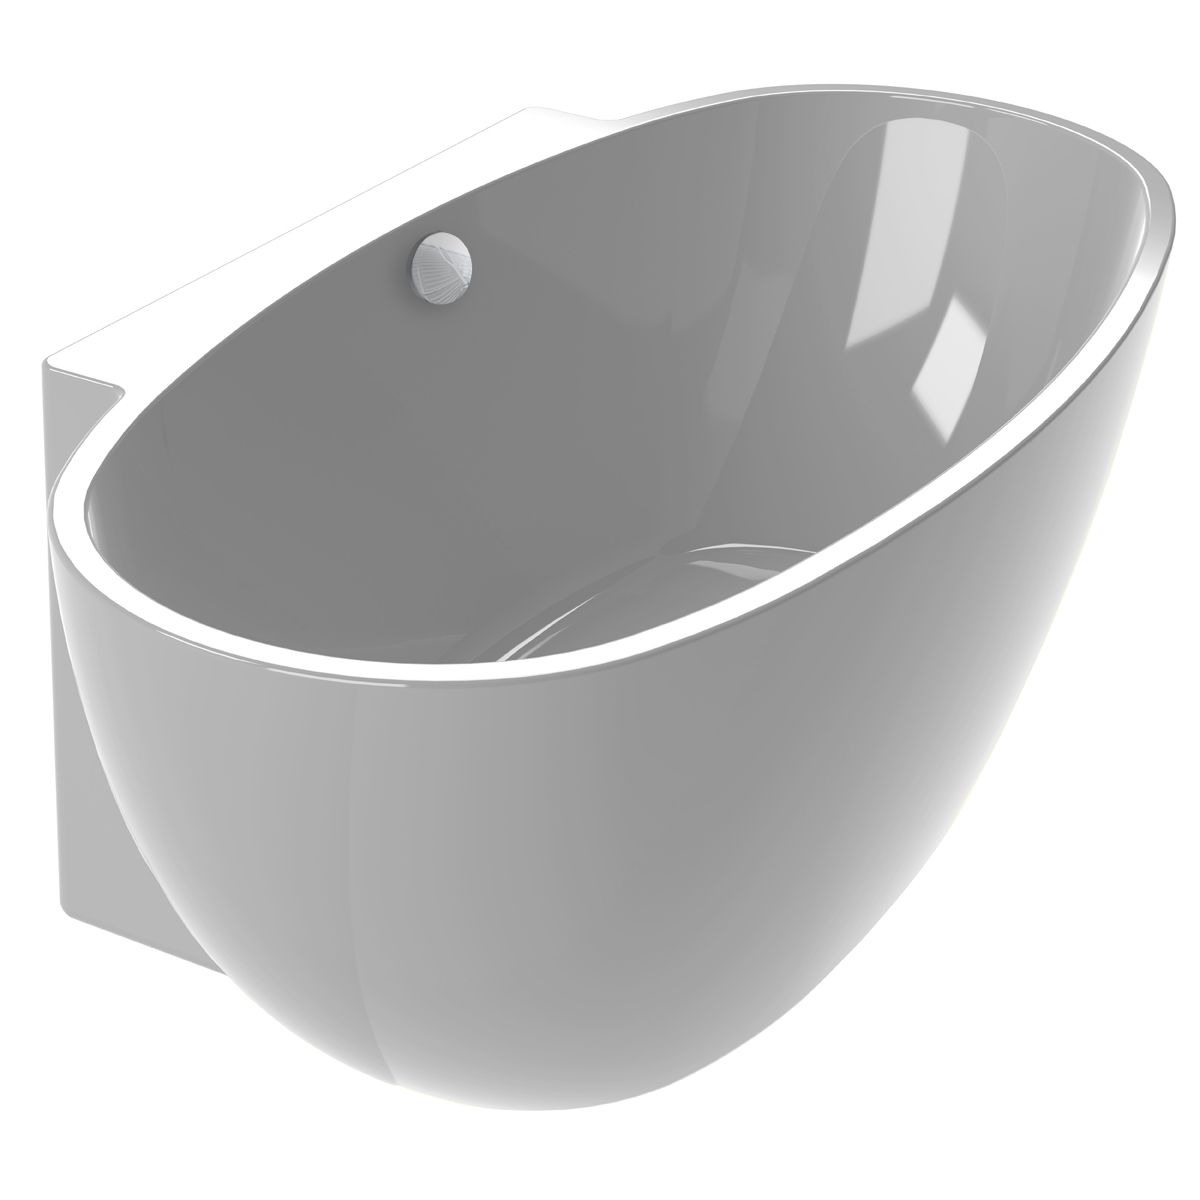 Baignoire Monobloc Autoportante Agata M Aquarine Baignoire Sanitaire Salle De Bain